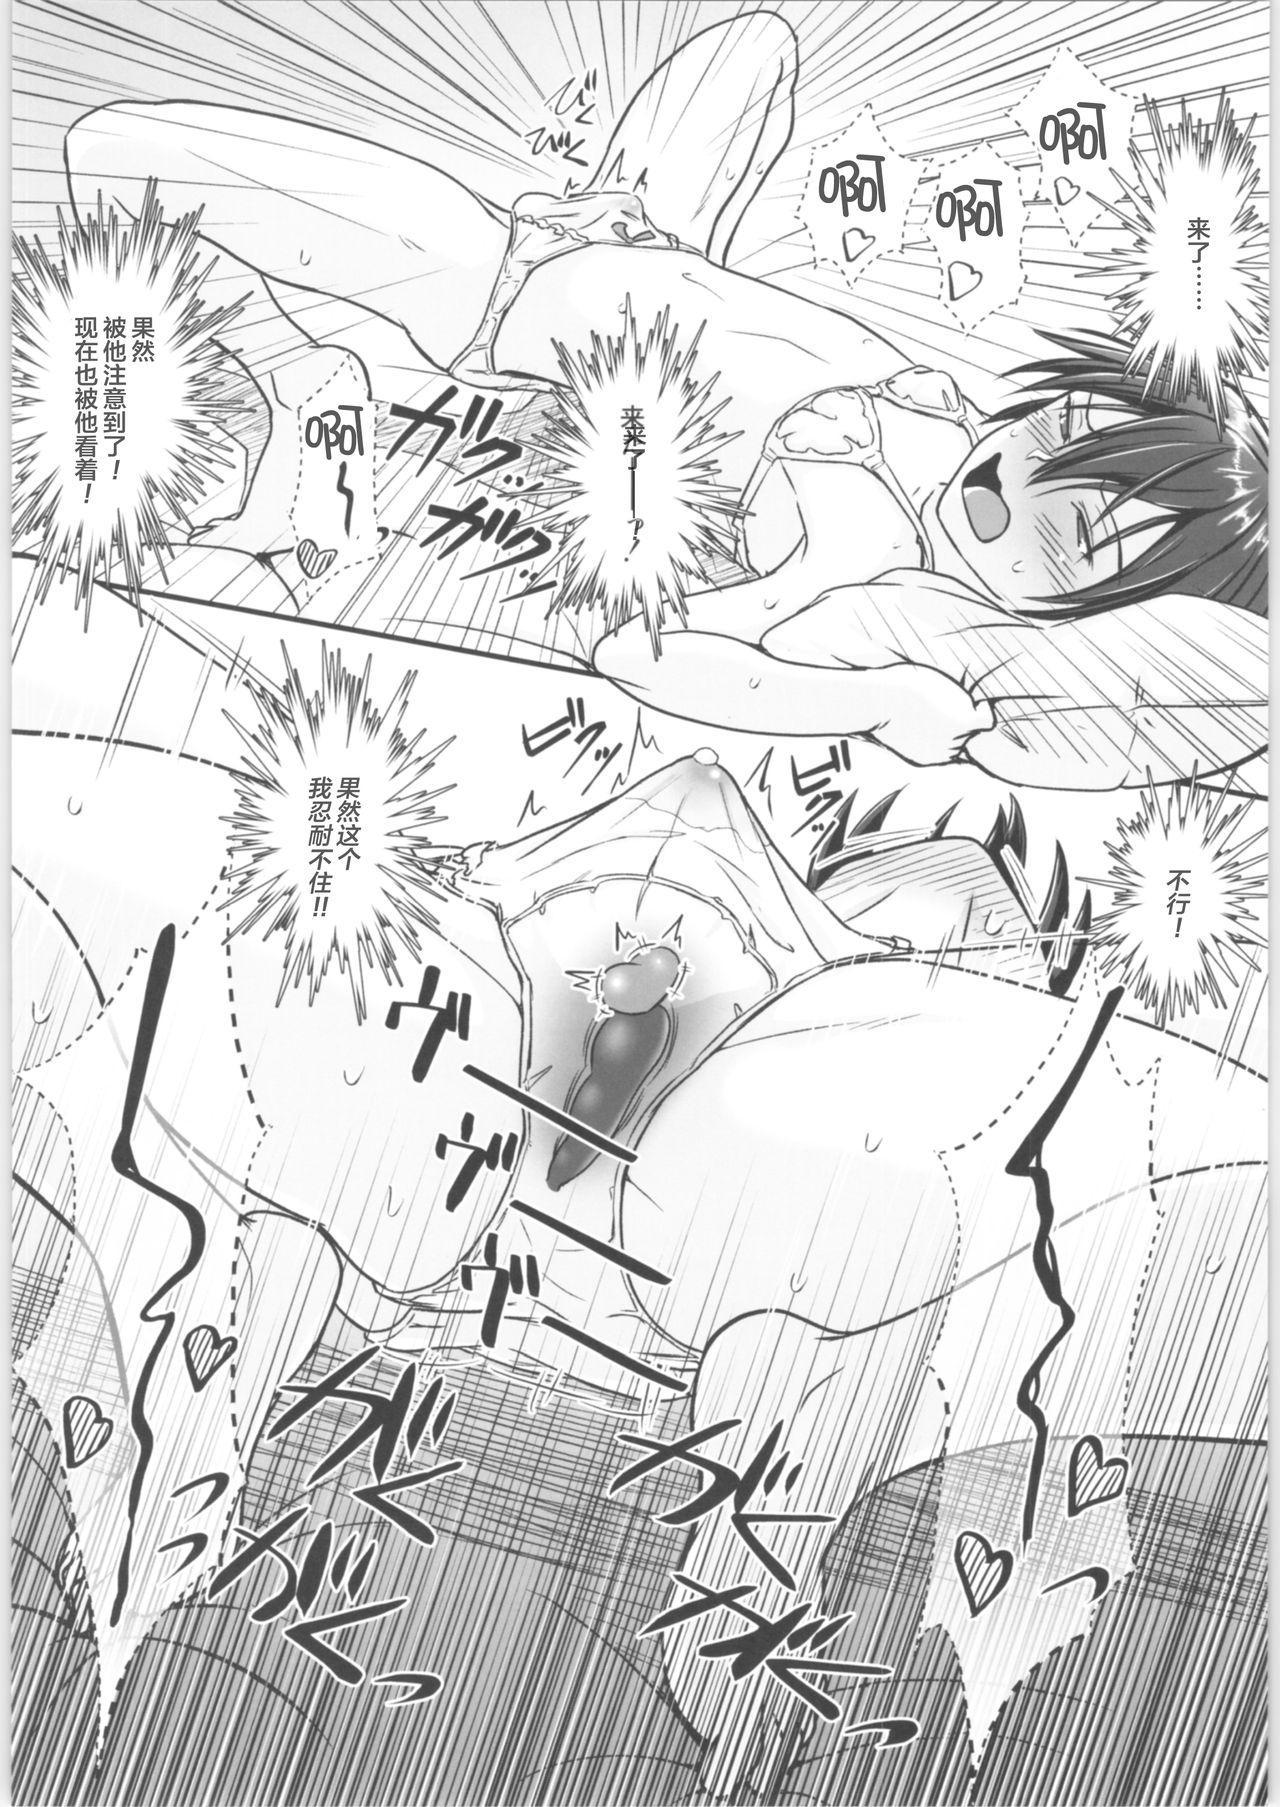 [Umari-ya (D-2)] Kiriko Route Another #02 ~Shitagi Josou Jii Kyouyou Hen~ (Sword Art Online)[Chinese]【不可视汉化】 25